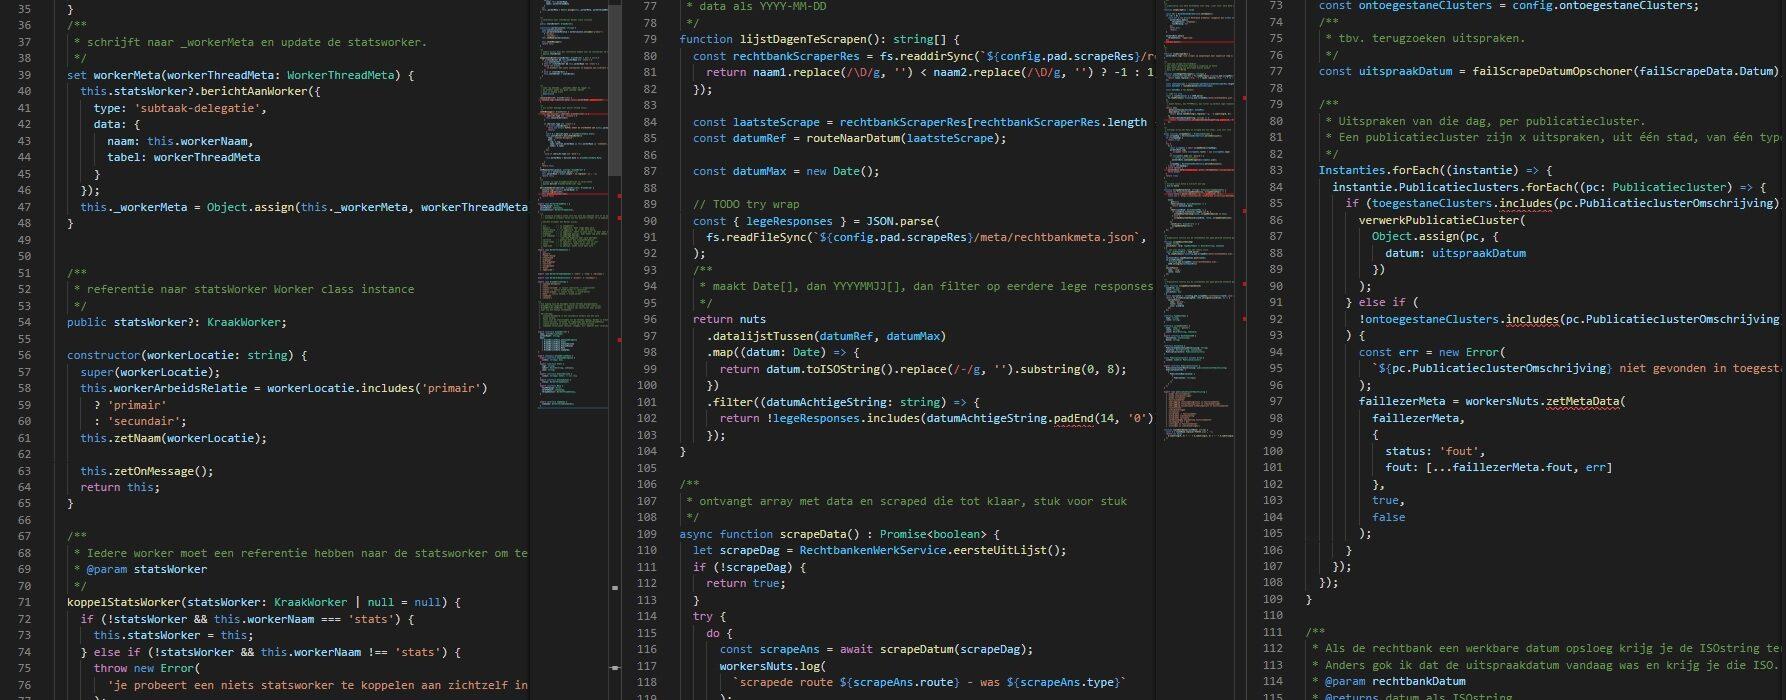 code sjerp